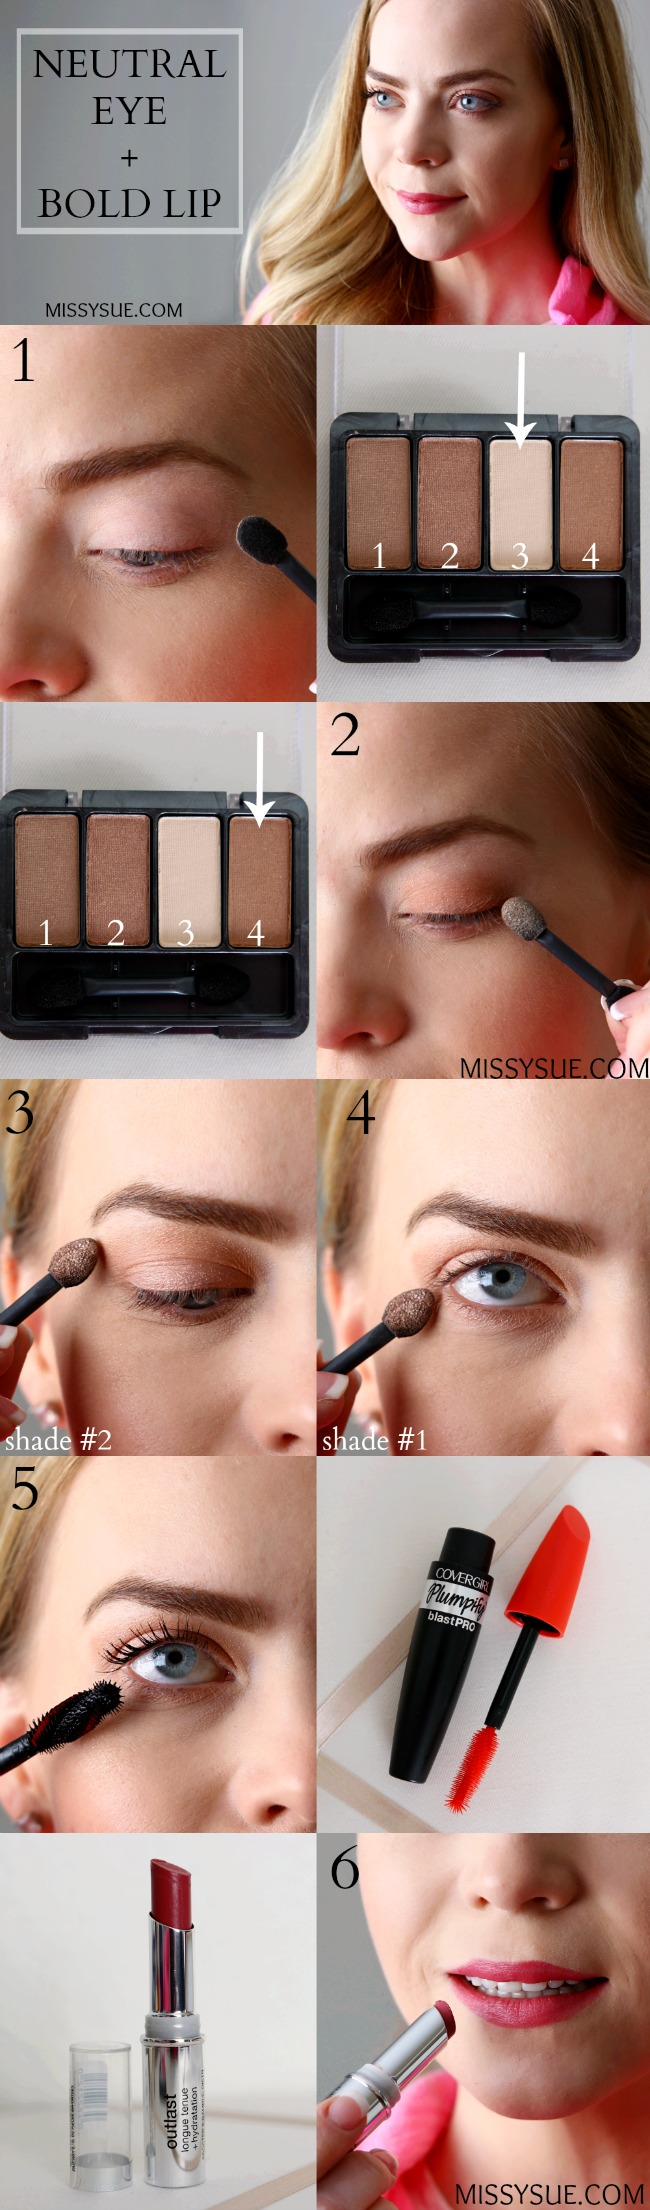 neutral-eye-and-bold-lip-tutorial